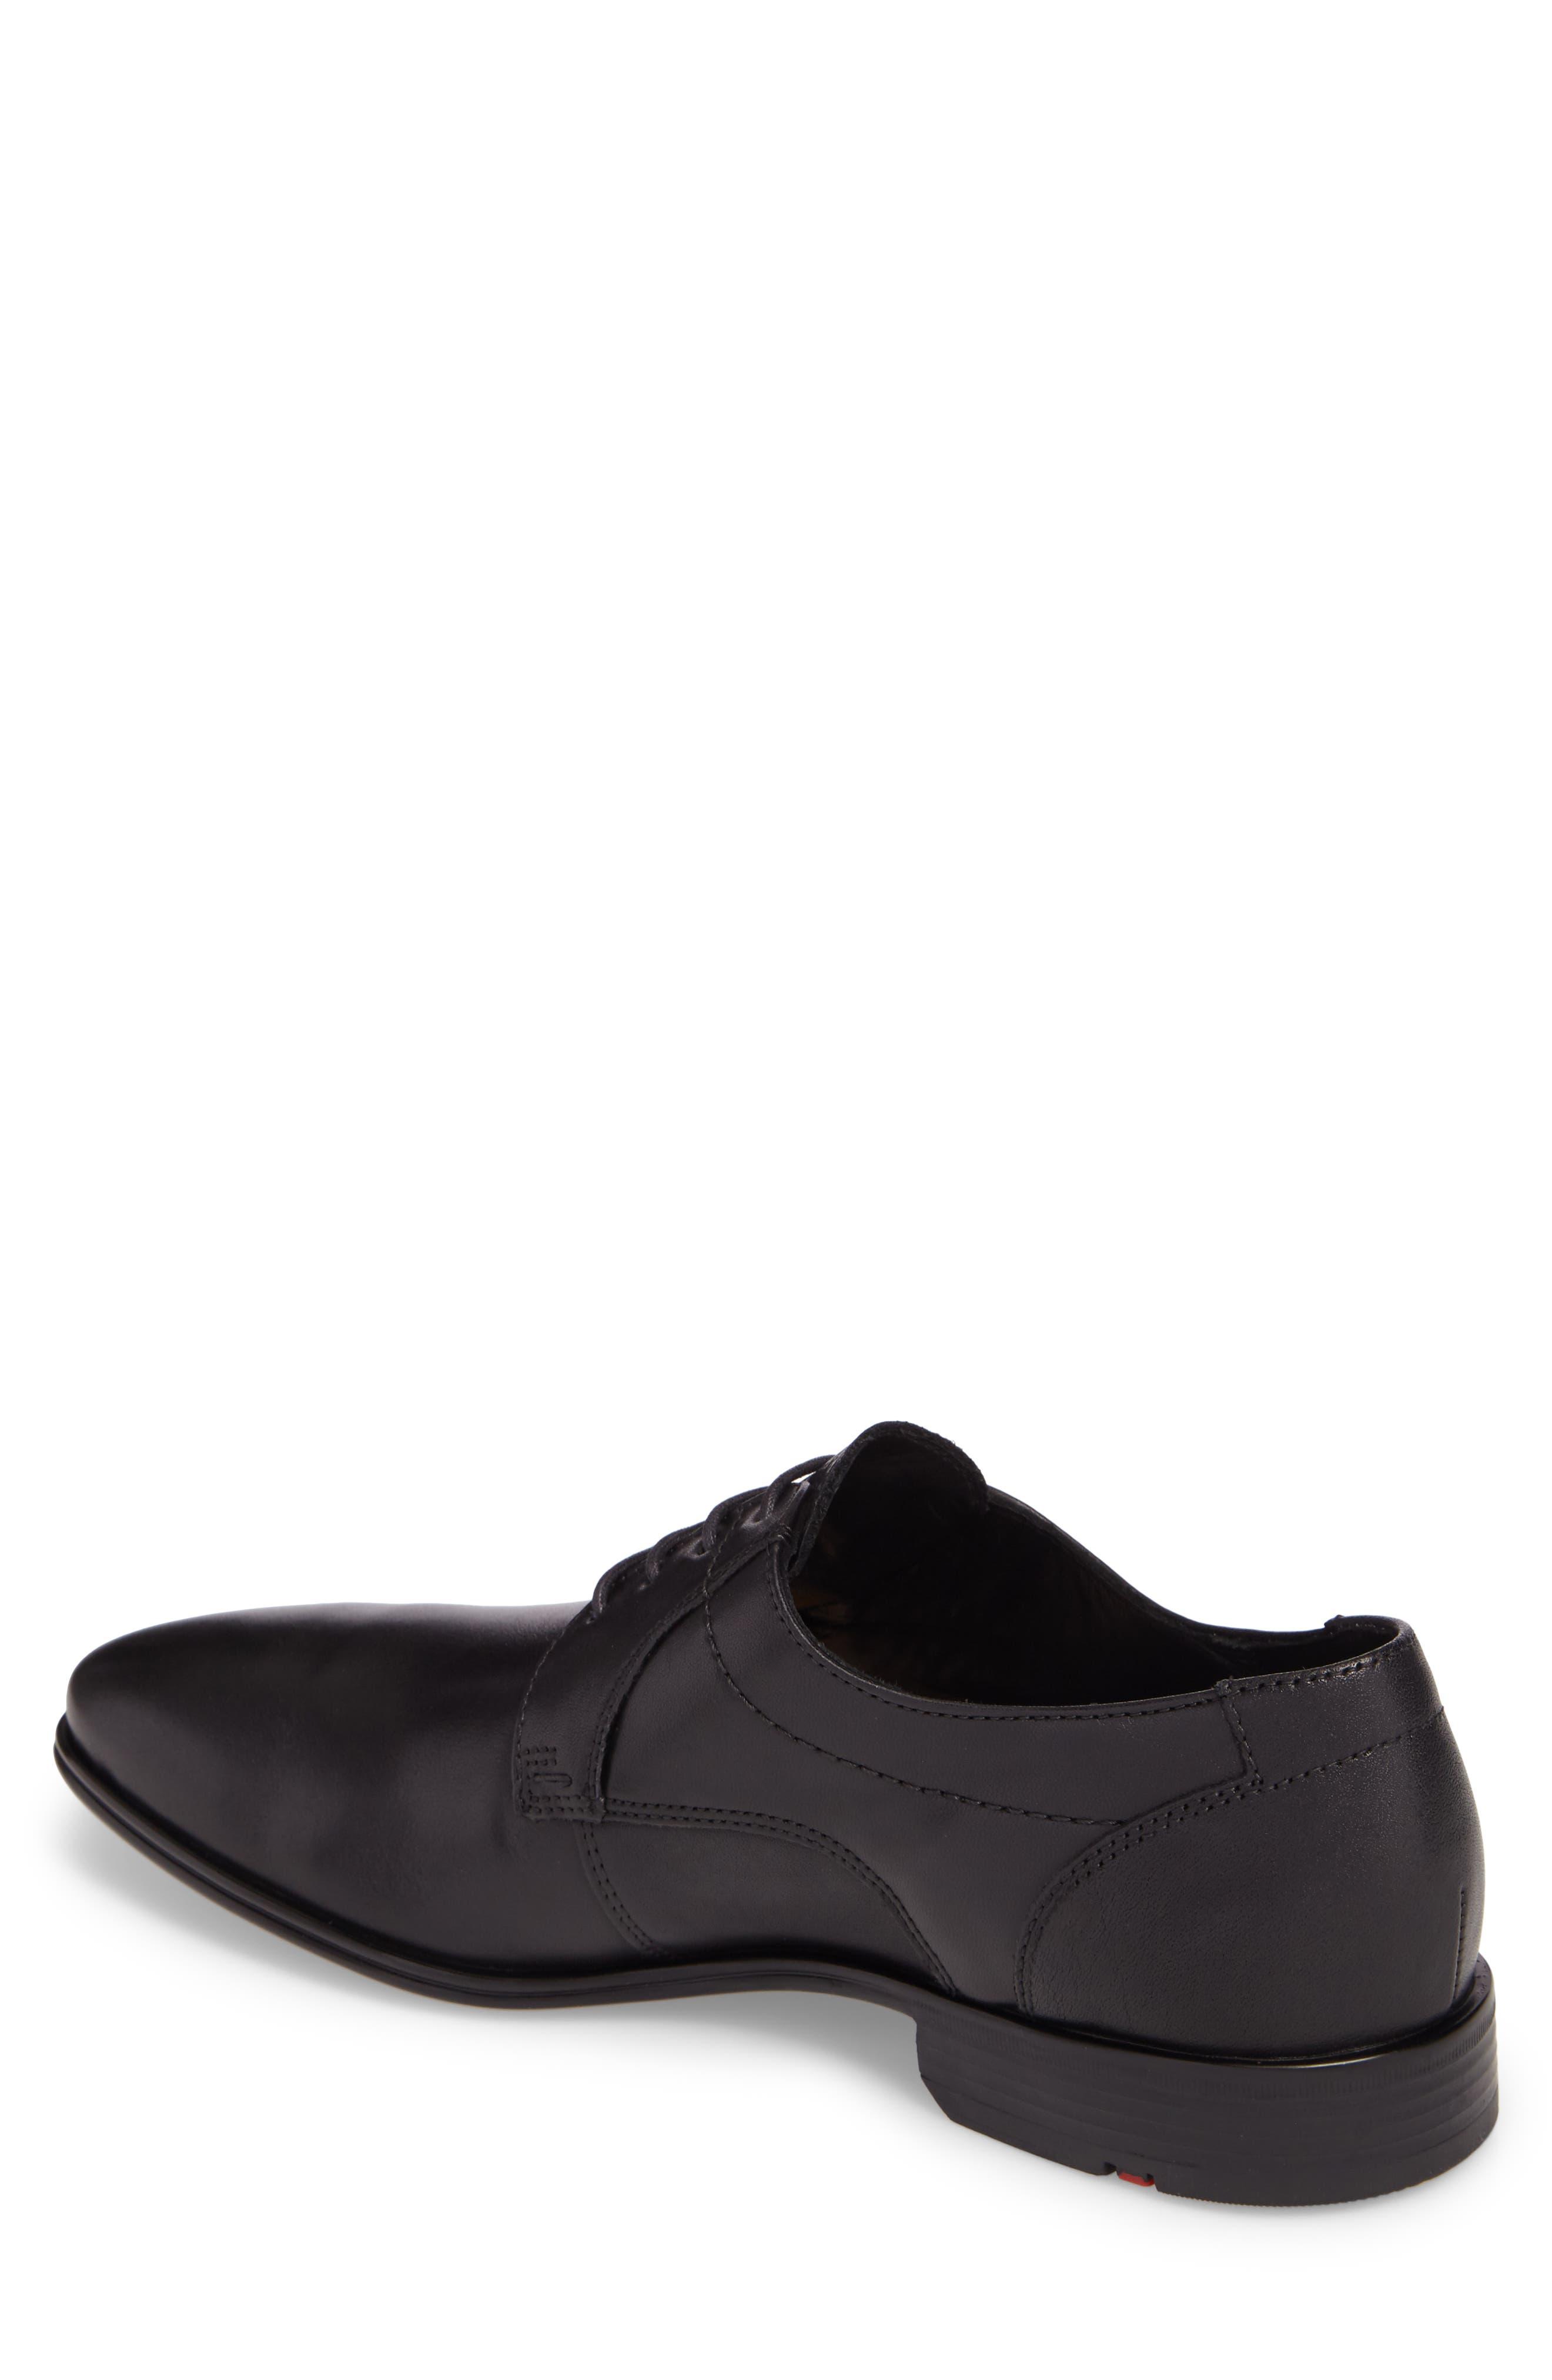 Osmond Plain Toe Derby,                             Alternate thumbnail 2, color,                             BLACK LEATHER